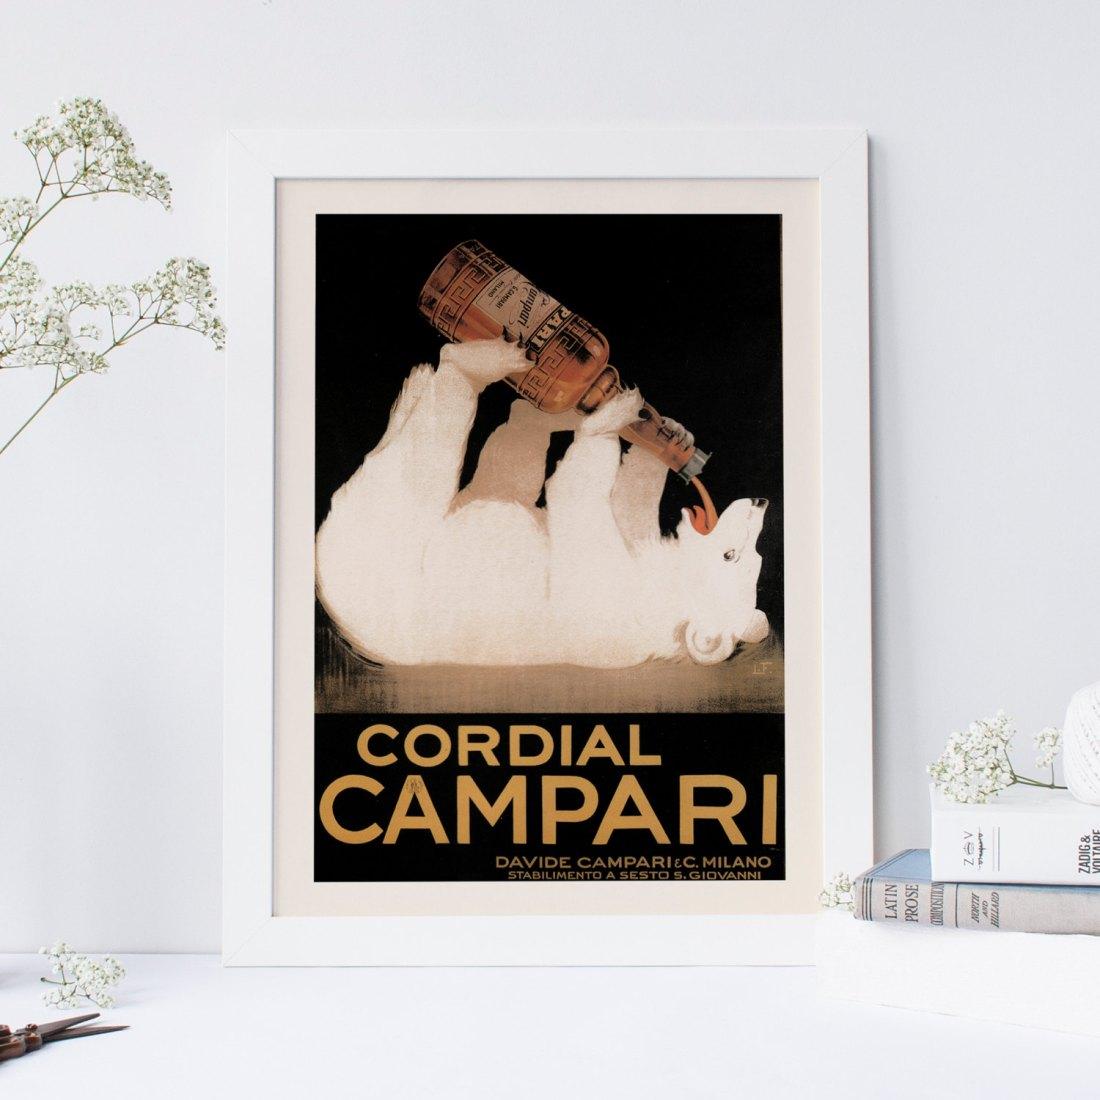 Poster for Cordial Campari. Undated.